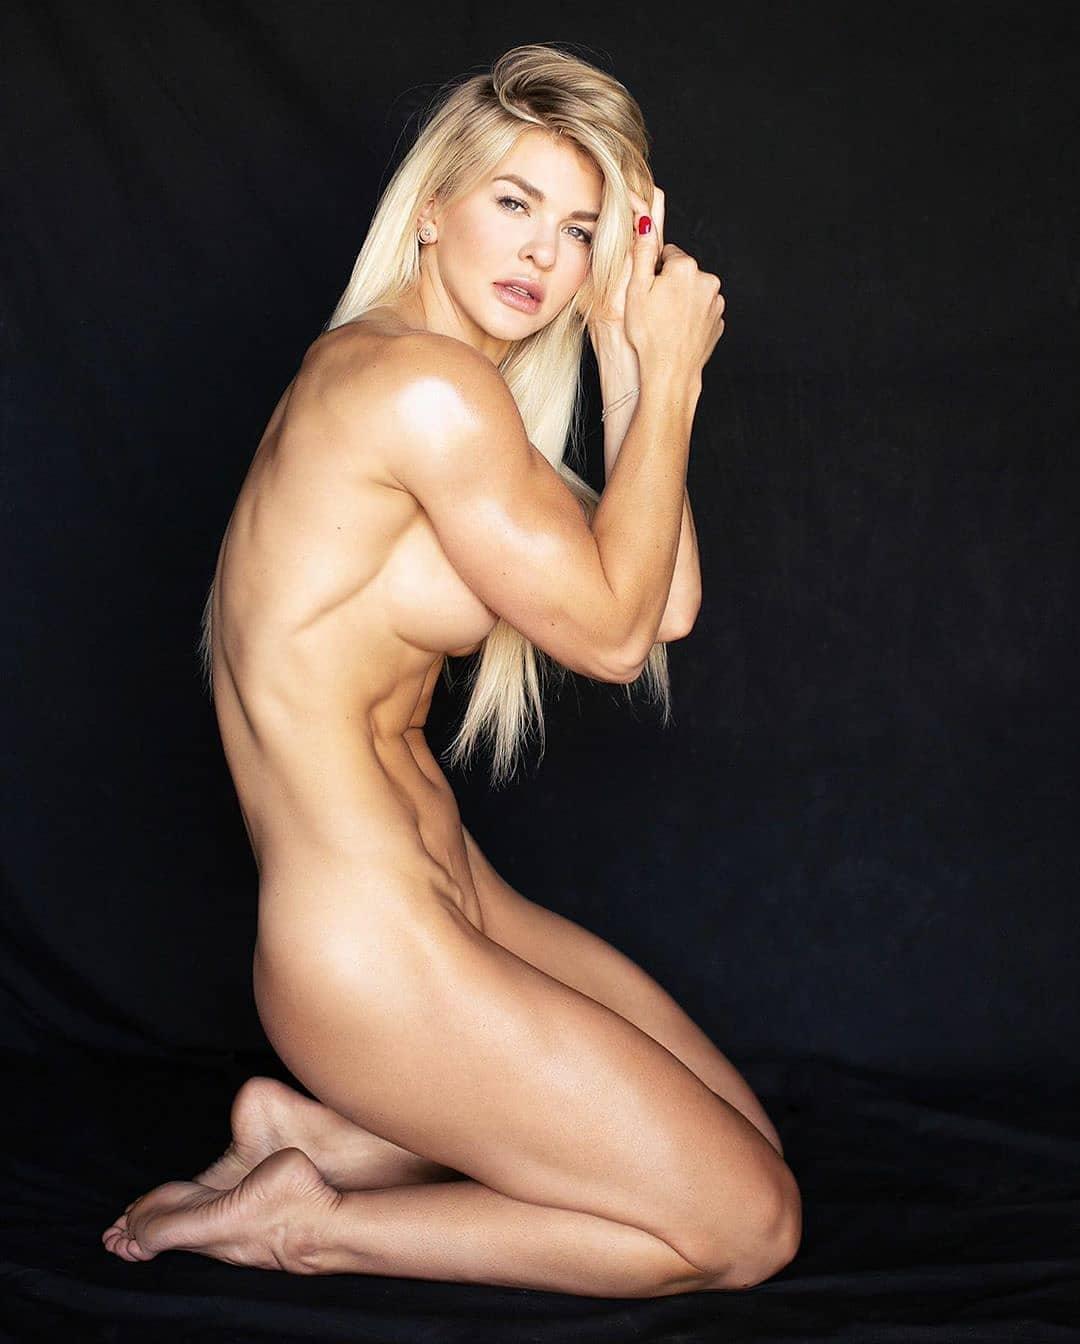 Brooke nackt Eva Eva LaRue